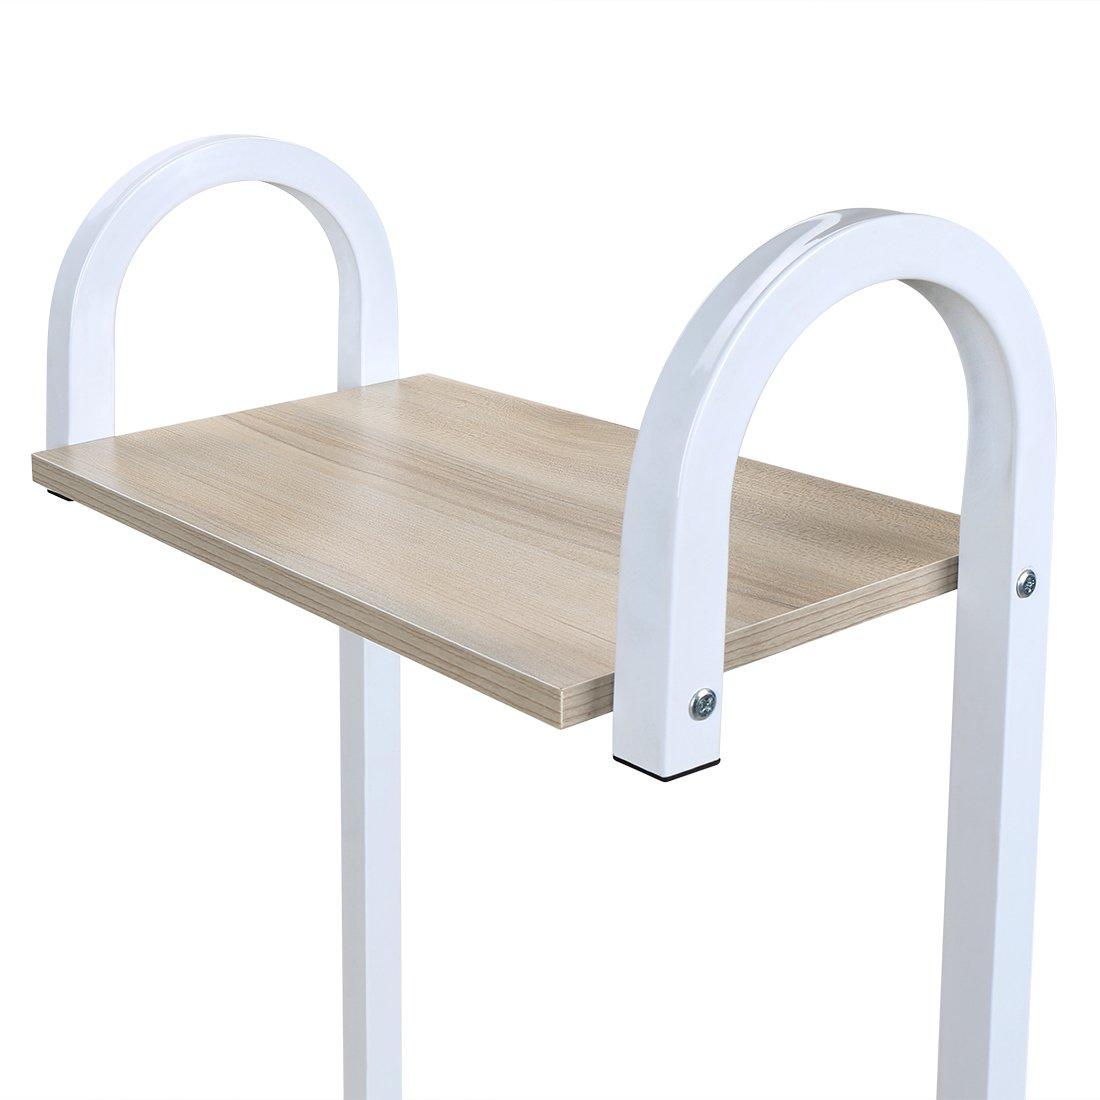 4 Tier Multipurpose Storage Shelf Bakers Rack, Metal Frame and Wooden Worktop for Kitchen by BestValue GO (Image #5)